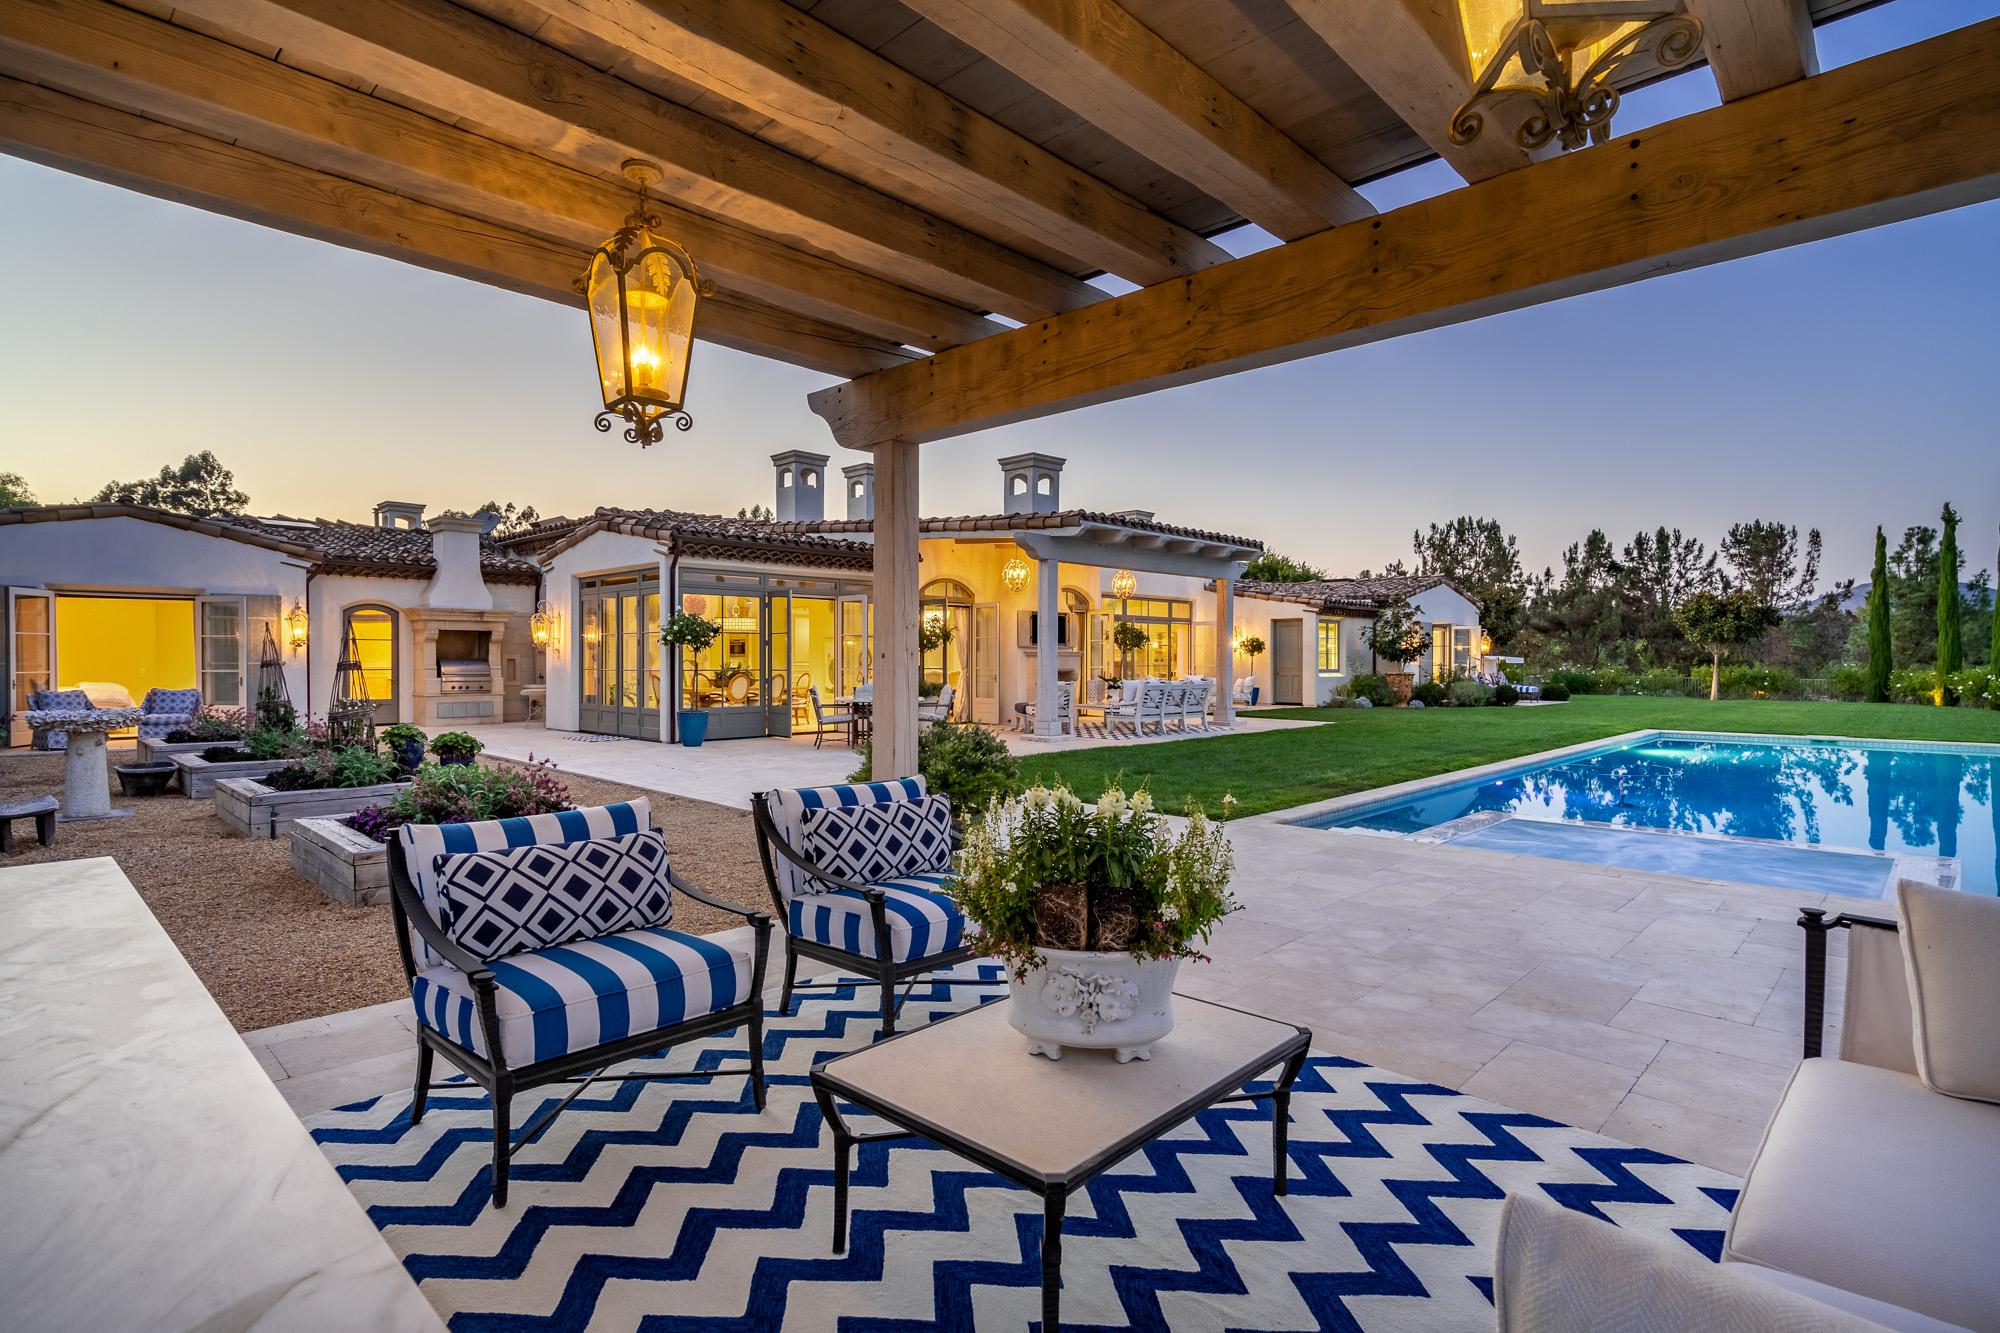 7097 Via Monalex -  Rancho Santa Fe, CA 92067